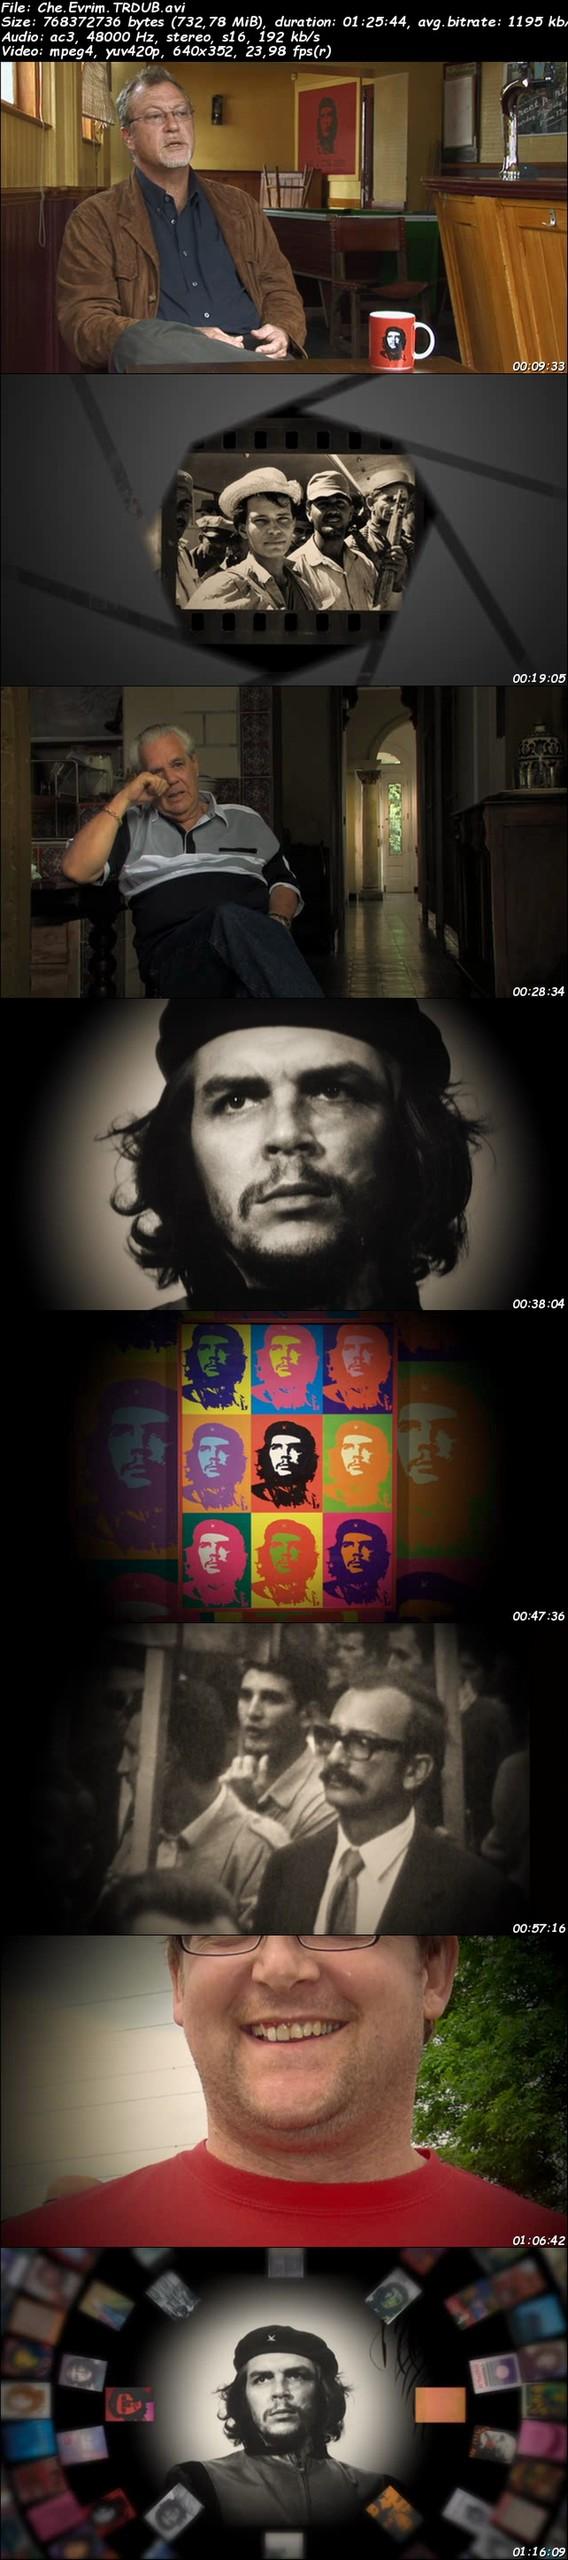 Che - Evrim - Chevolution  (2008) DVDRip XviD Türkçe Dublaj - Tek Link